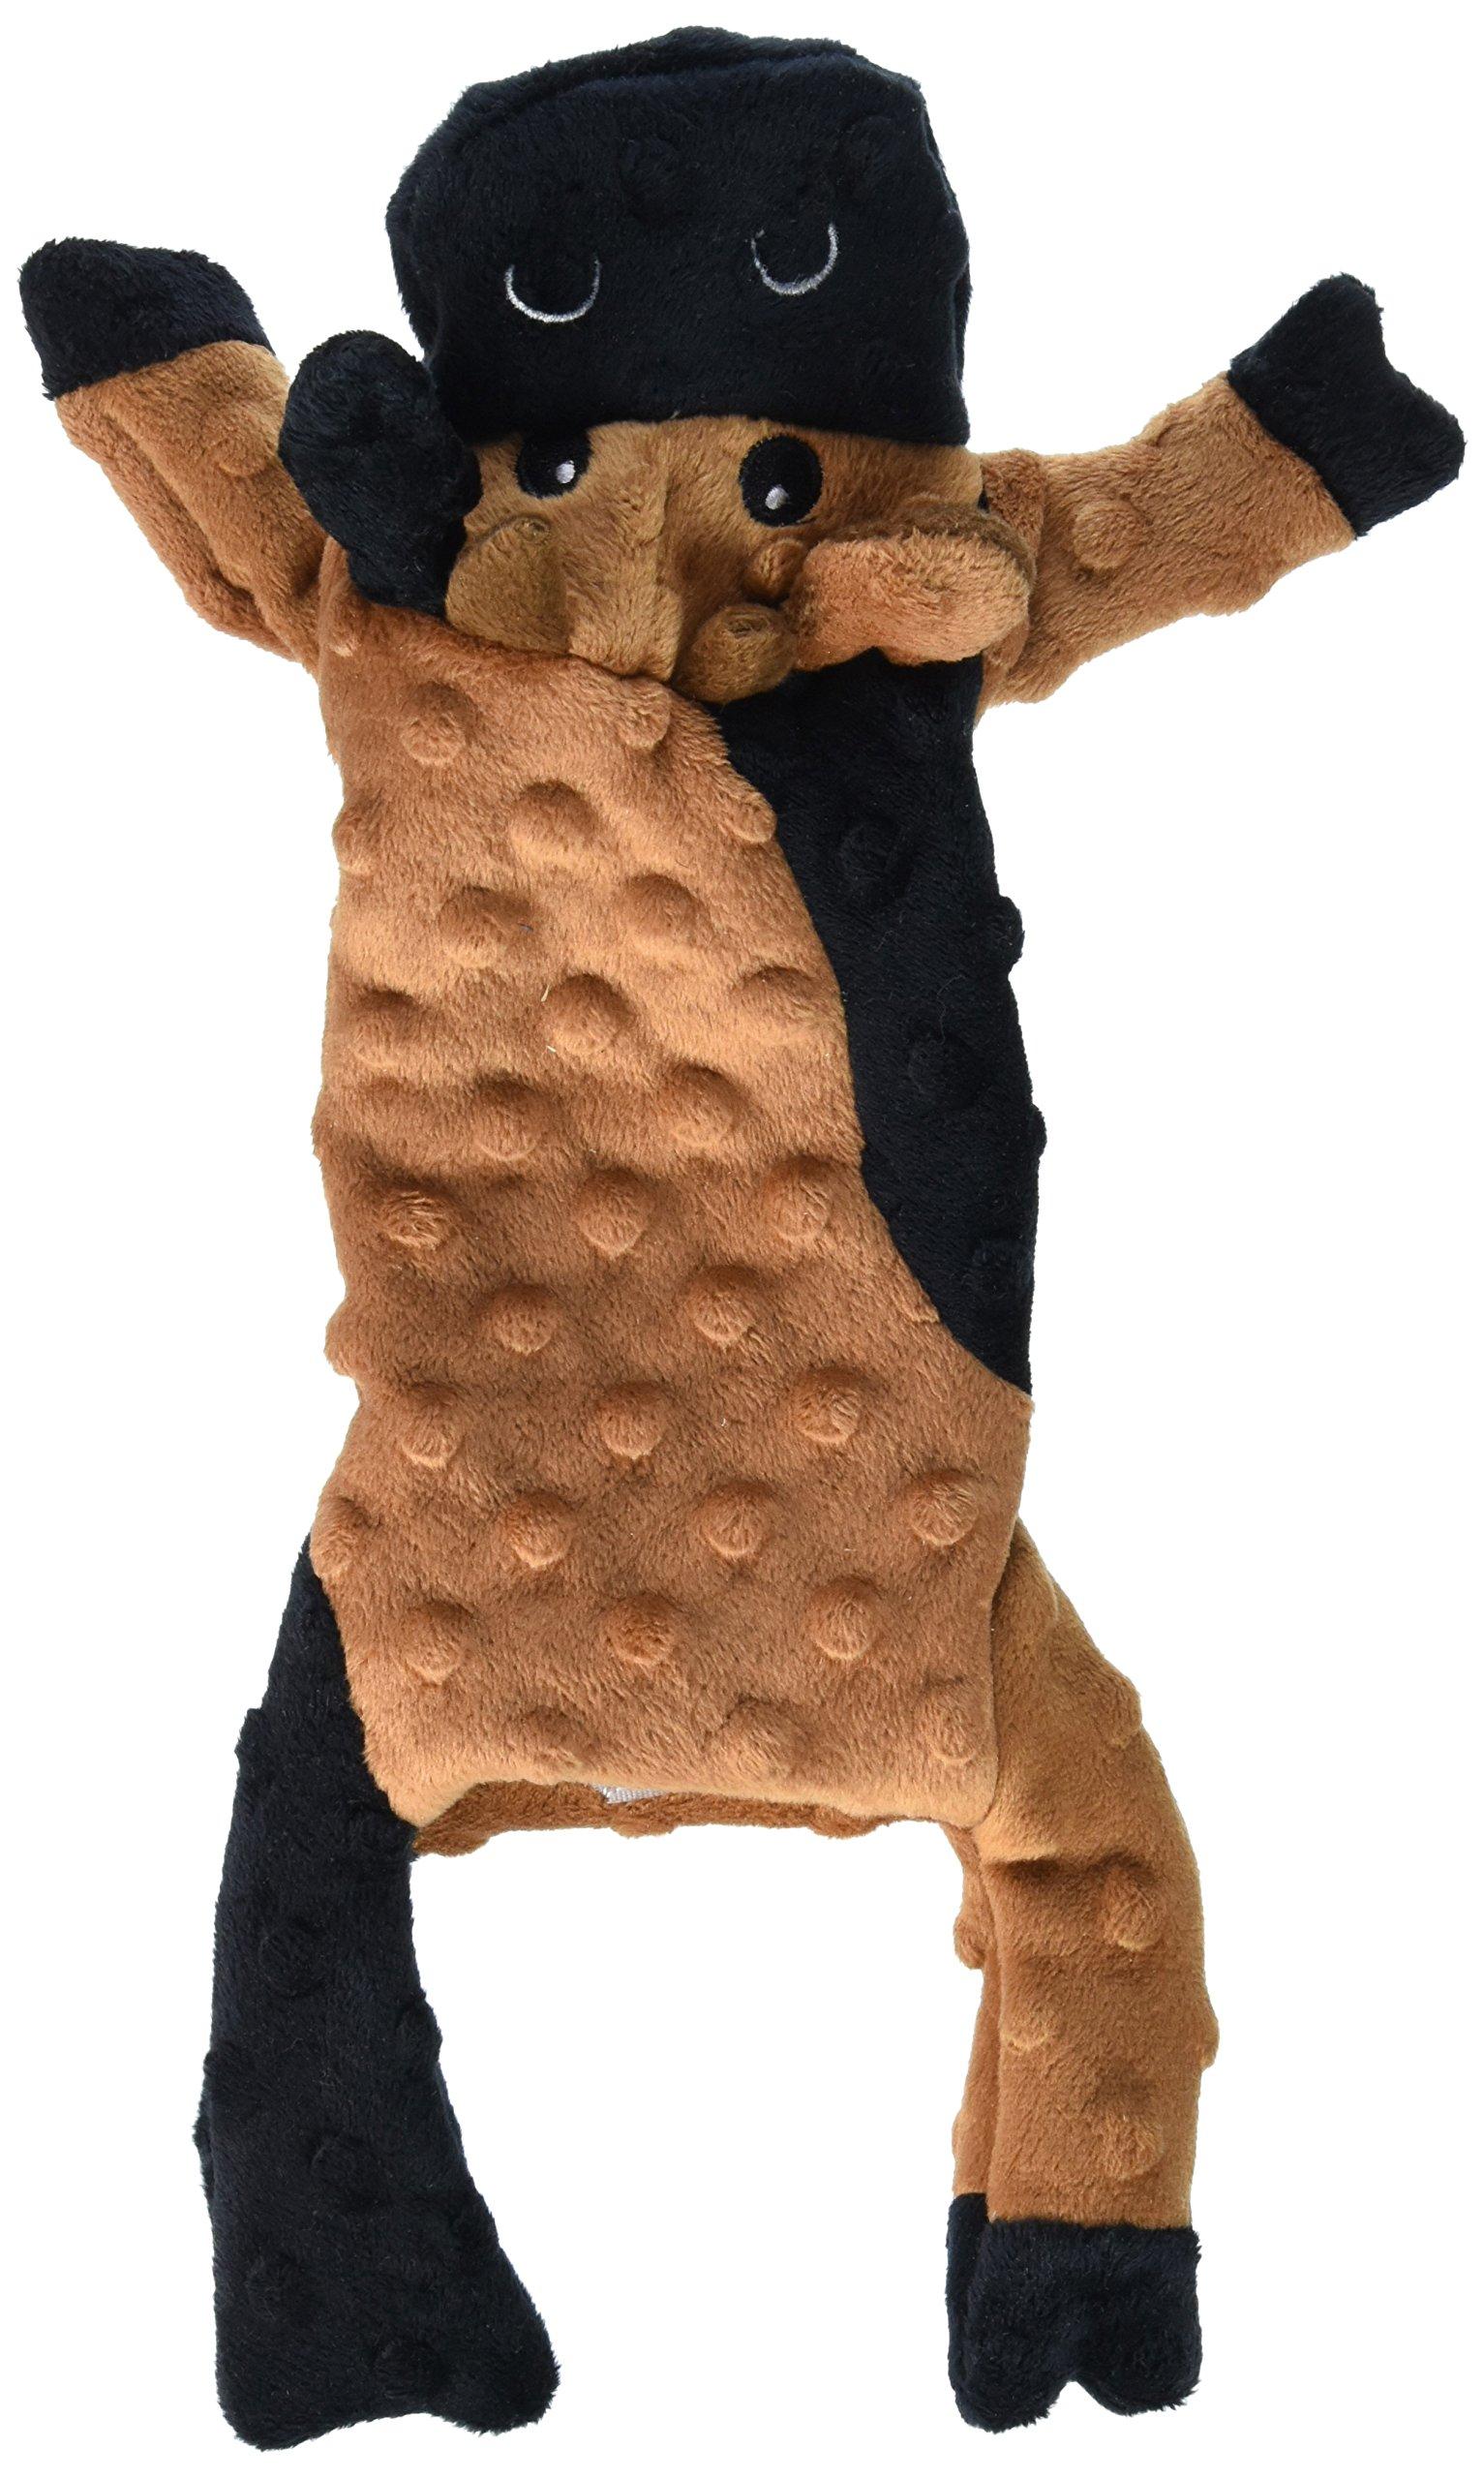 Ethical-Pets-54094-Skinneeez-Extreme-Stuffing-Free-Dog-Toy